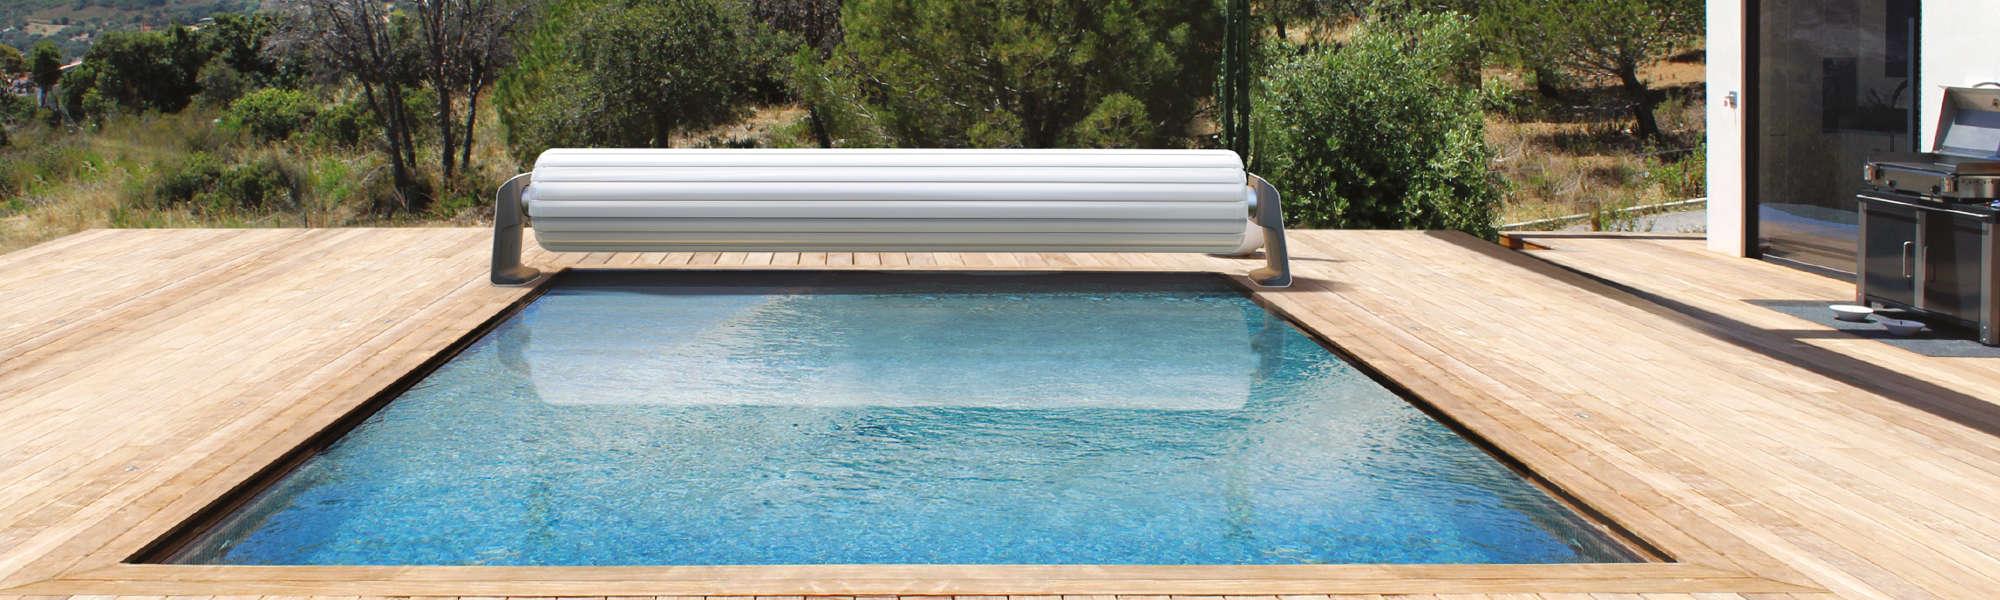 Entretien d'une piscine